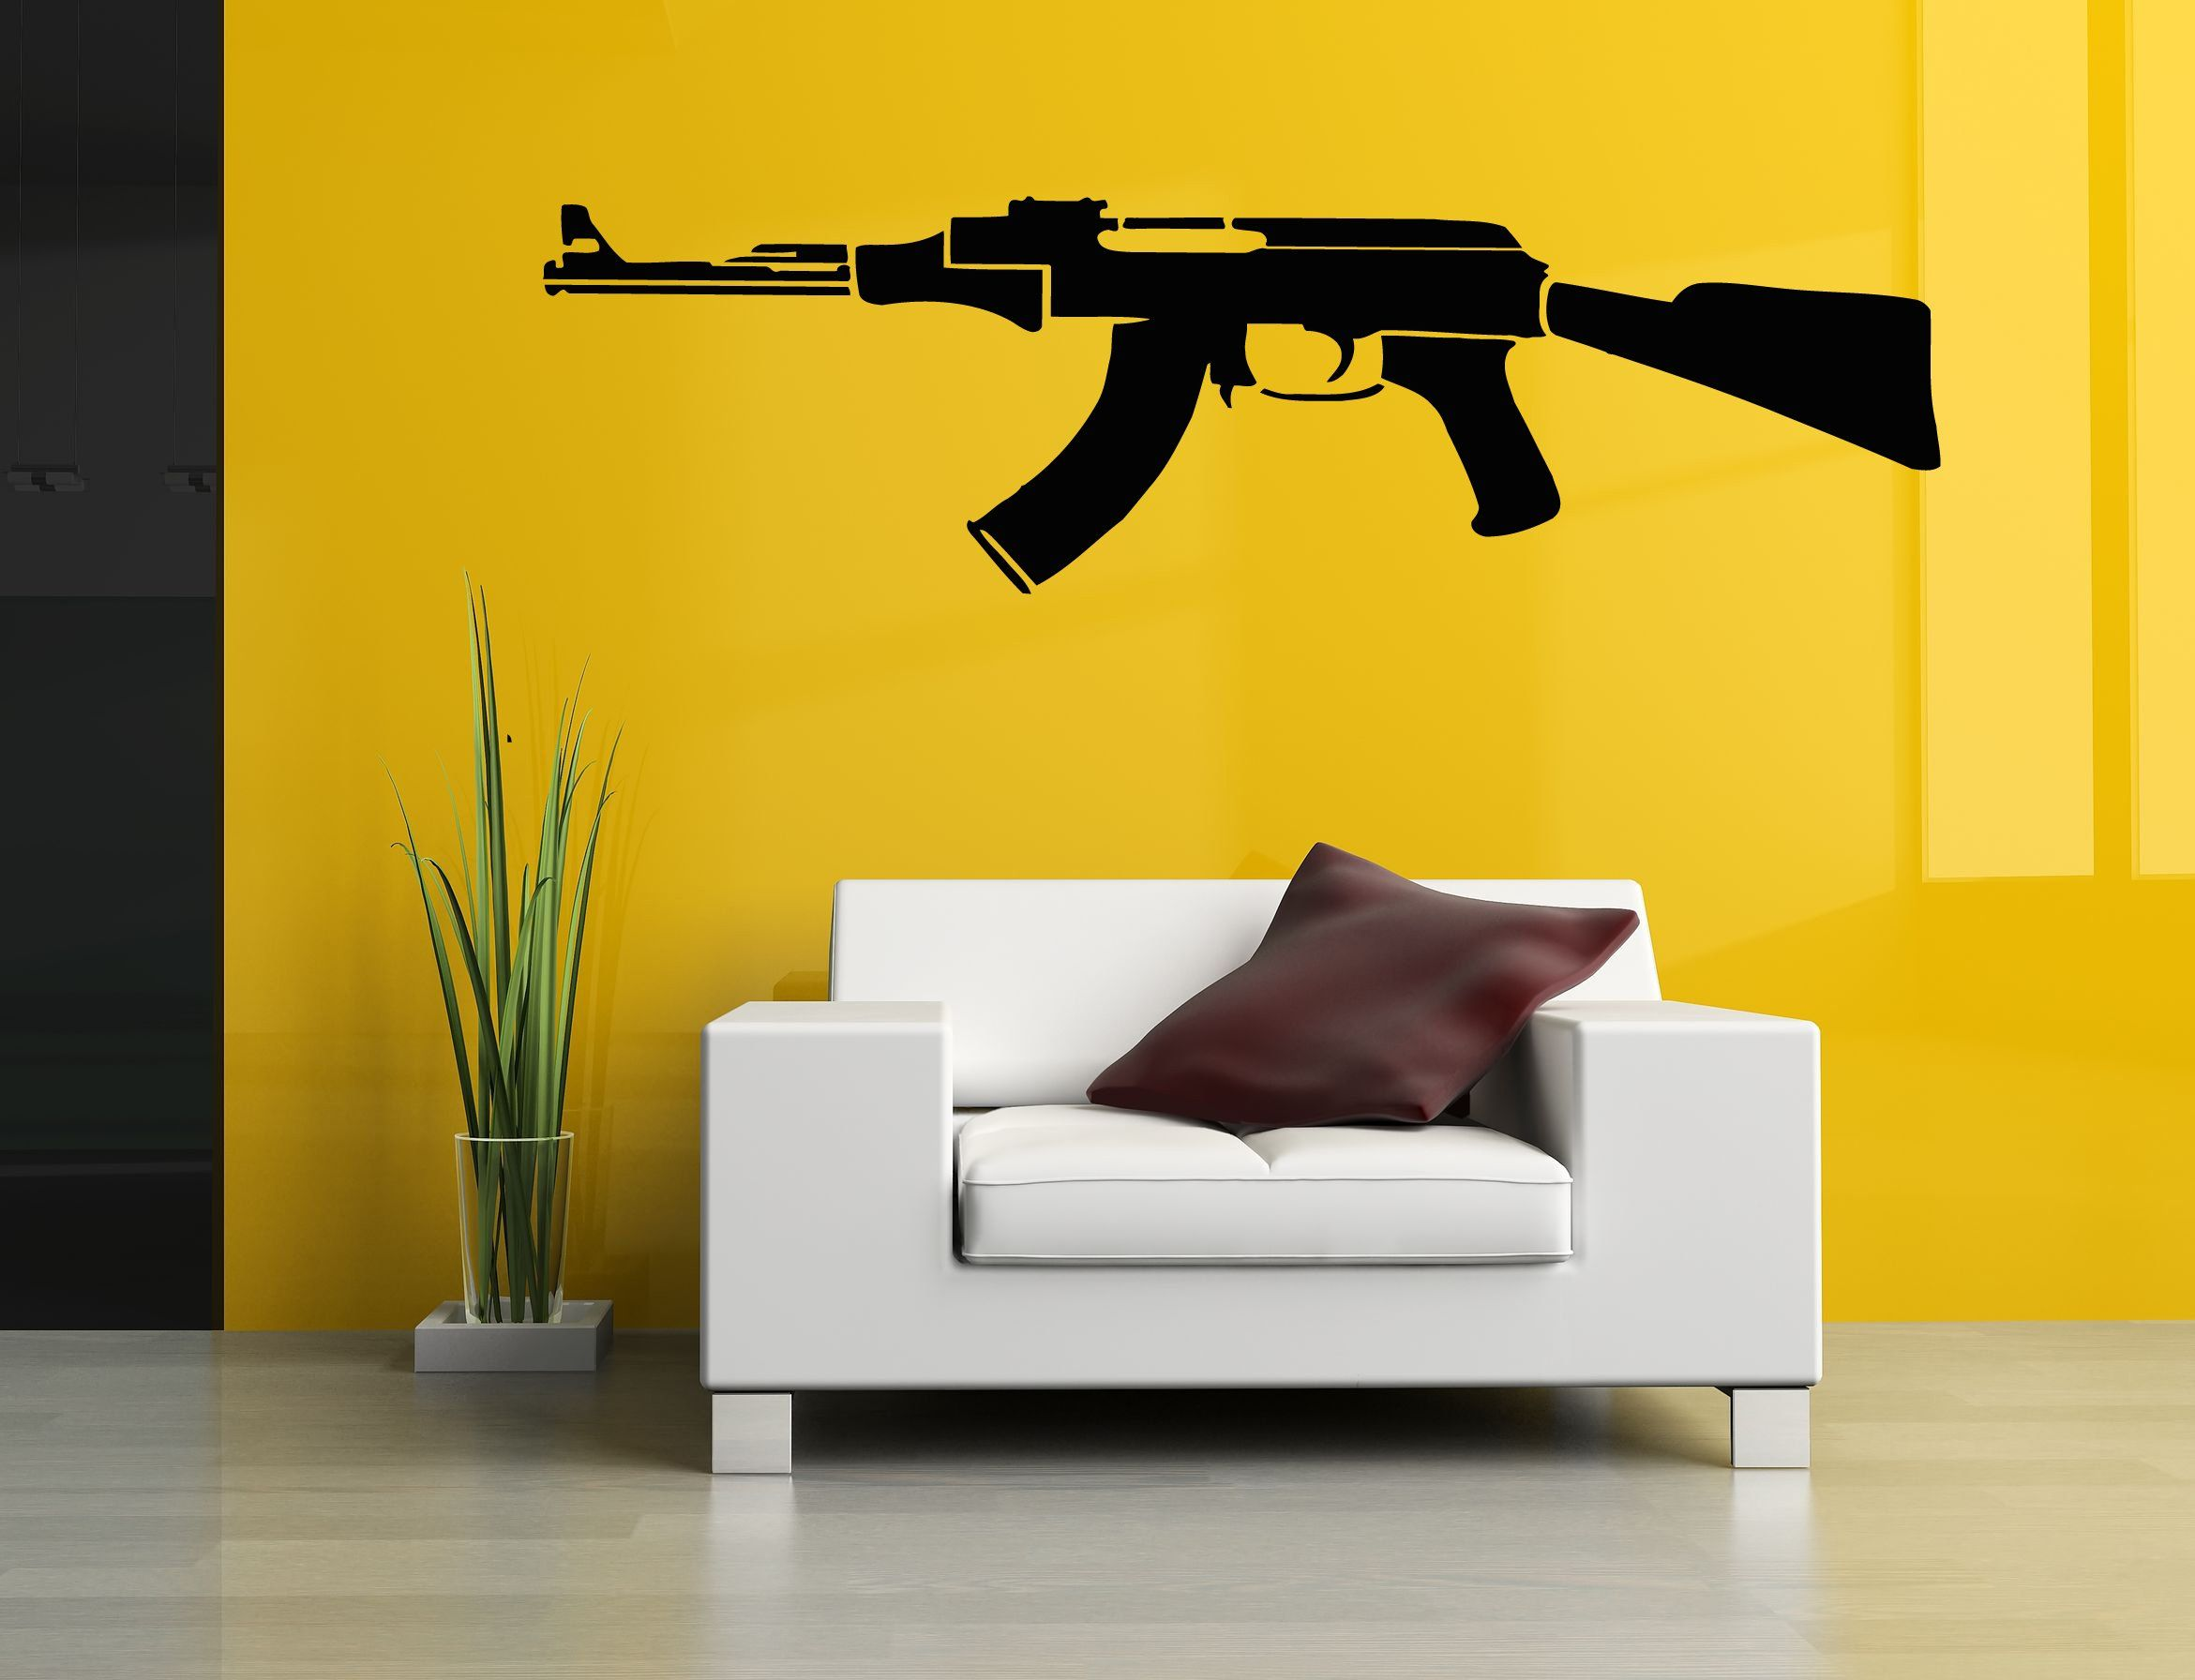 Wall Room Decor Art Vinyl Sticker Mural Decal AK-47 Machine Gun ...